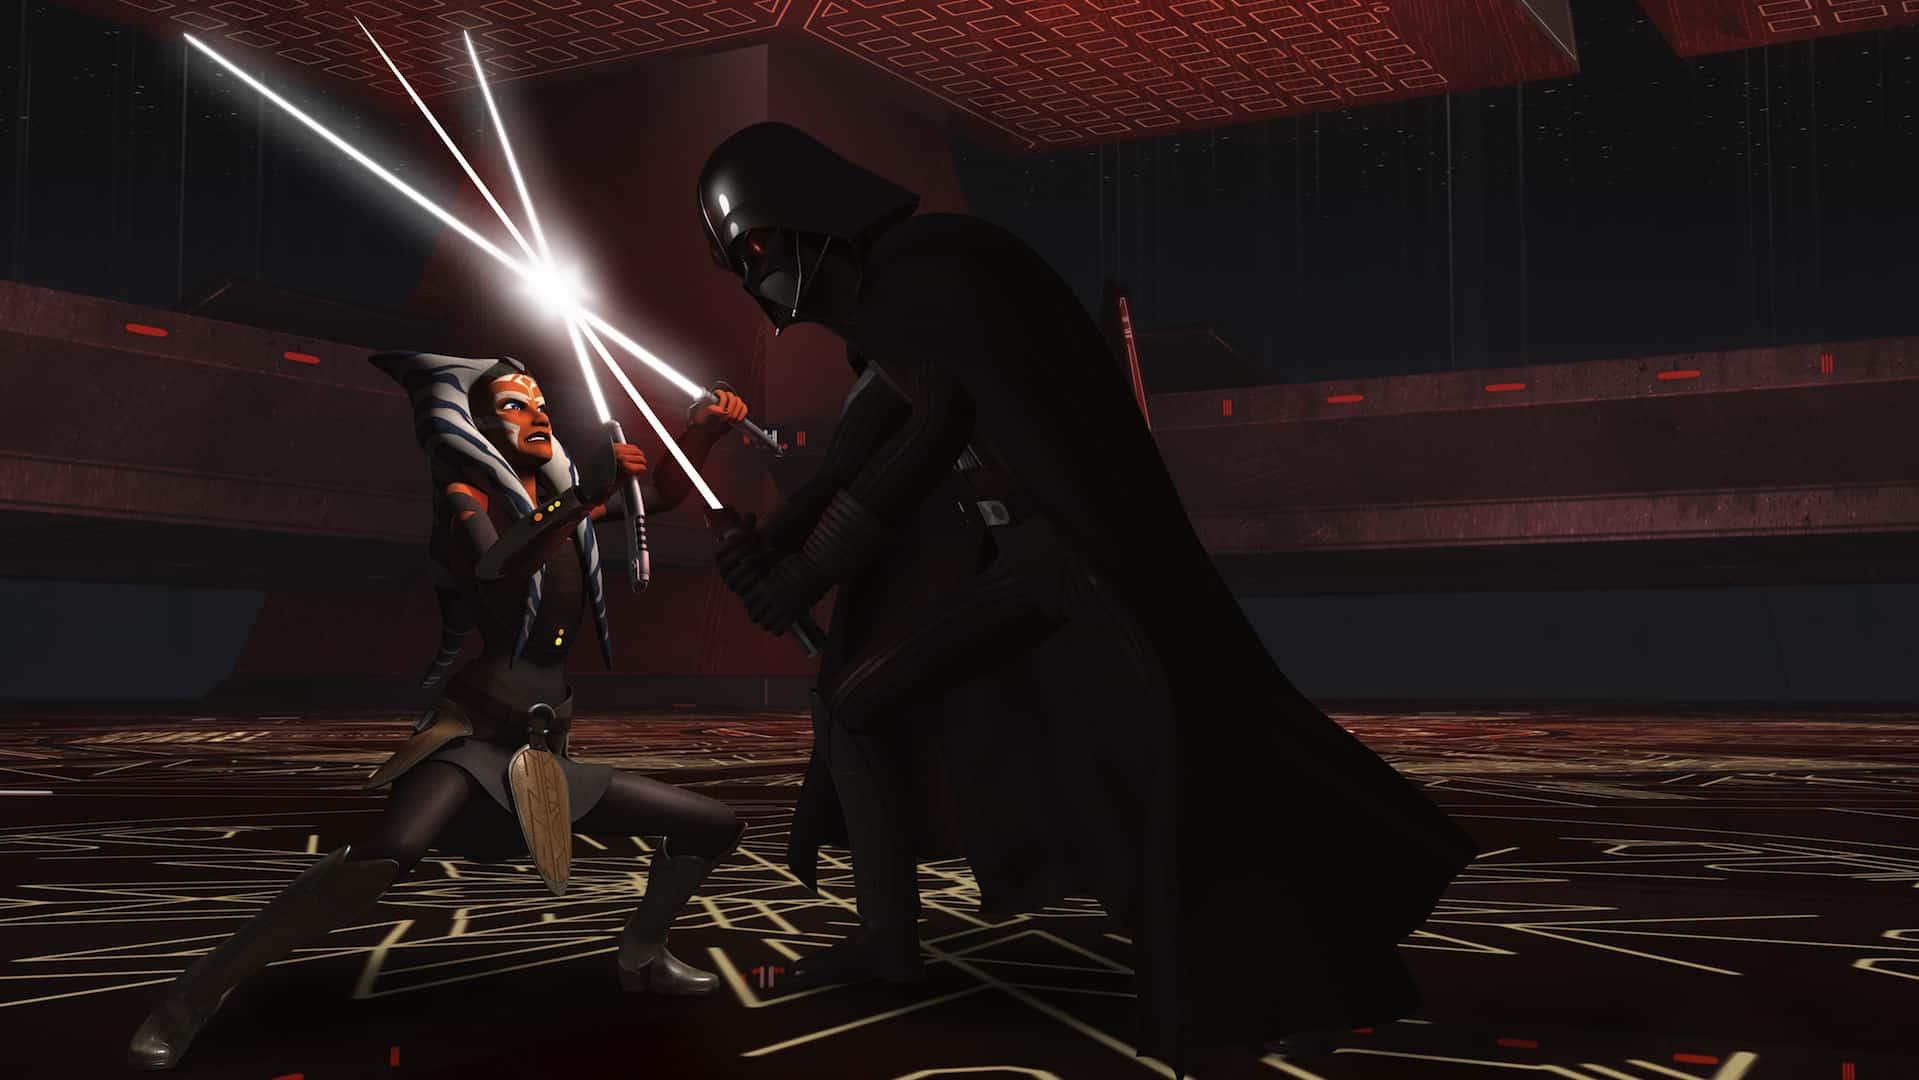 Star Wars Rebels – 'Twilight of the Apprentice'